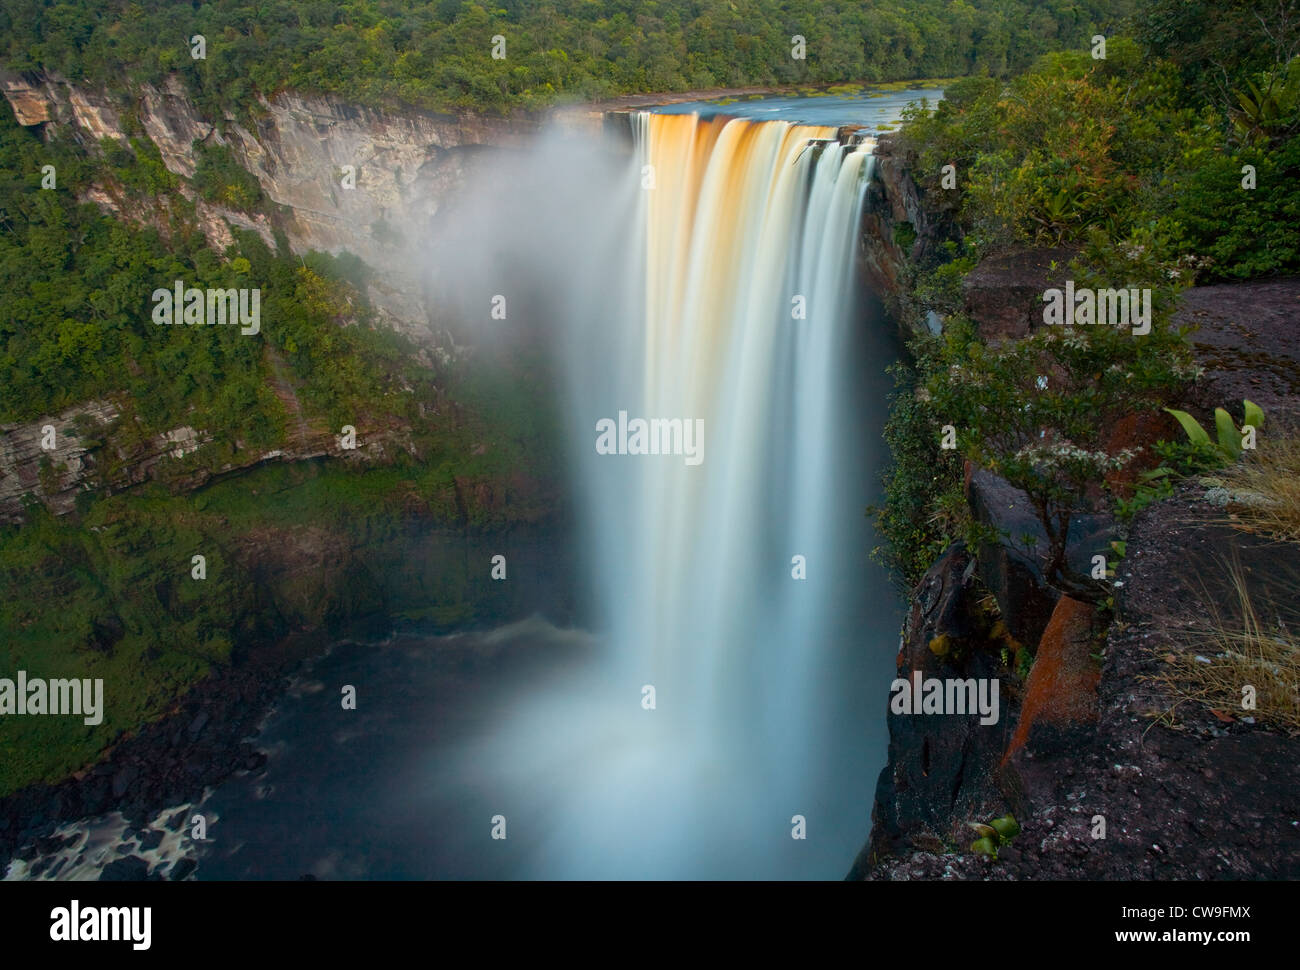 KAIETEUR FALLS, the second highest single drop waterfall in South America, Kaieteur National Park, Potaro river, - Stock Image